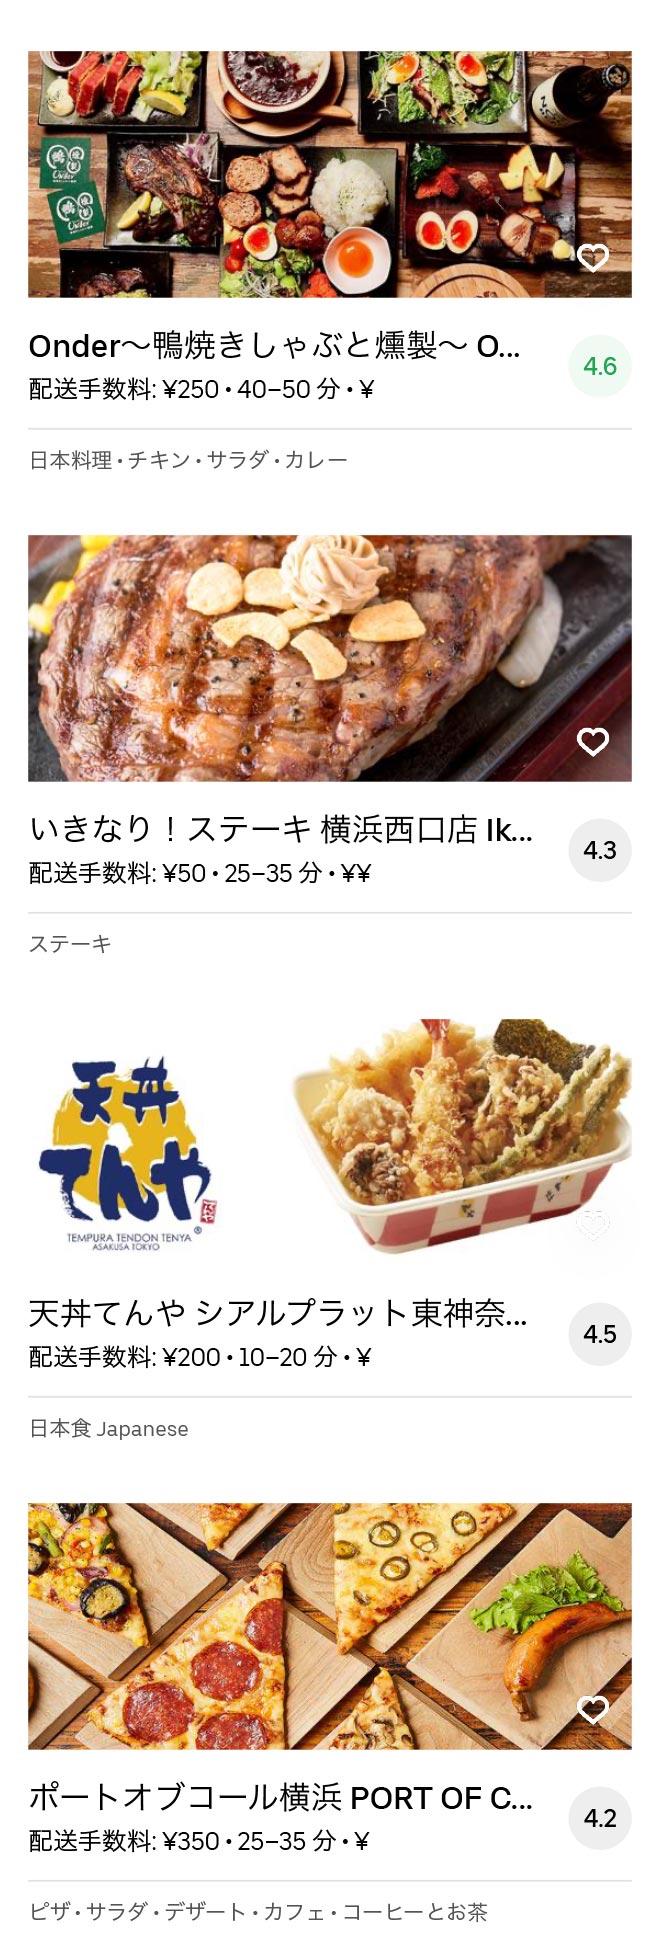 Yokohama hakuraku menu 2004 12